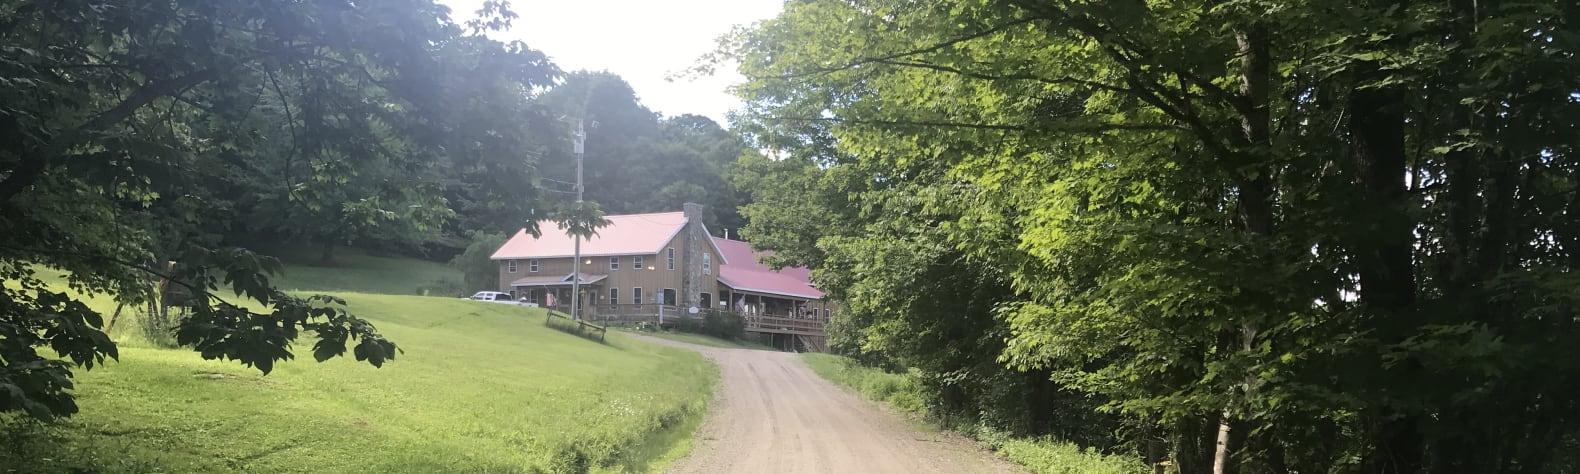 Terrie D.'s Land